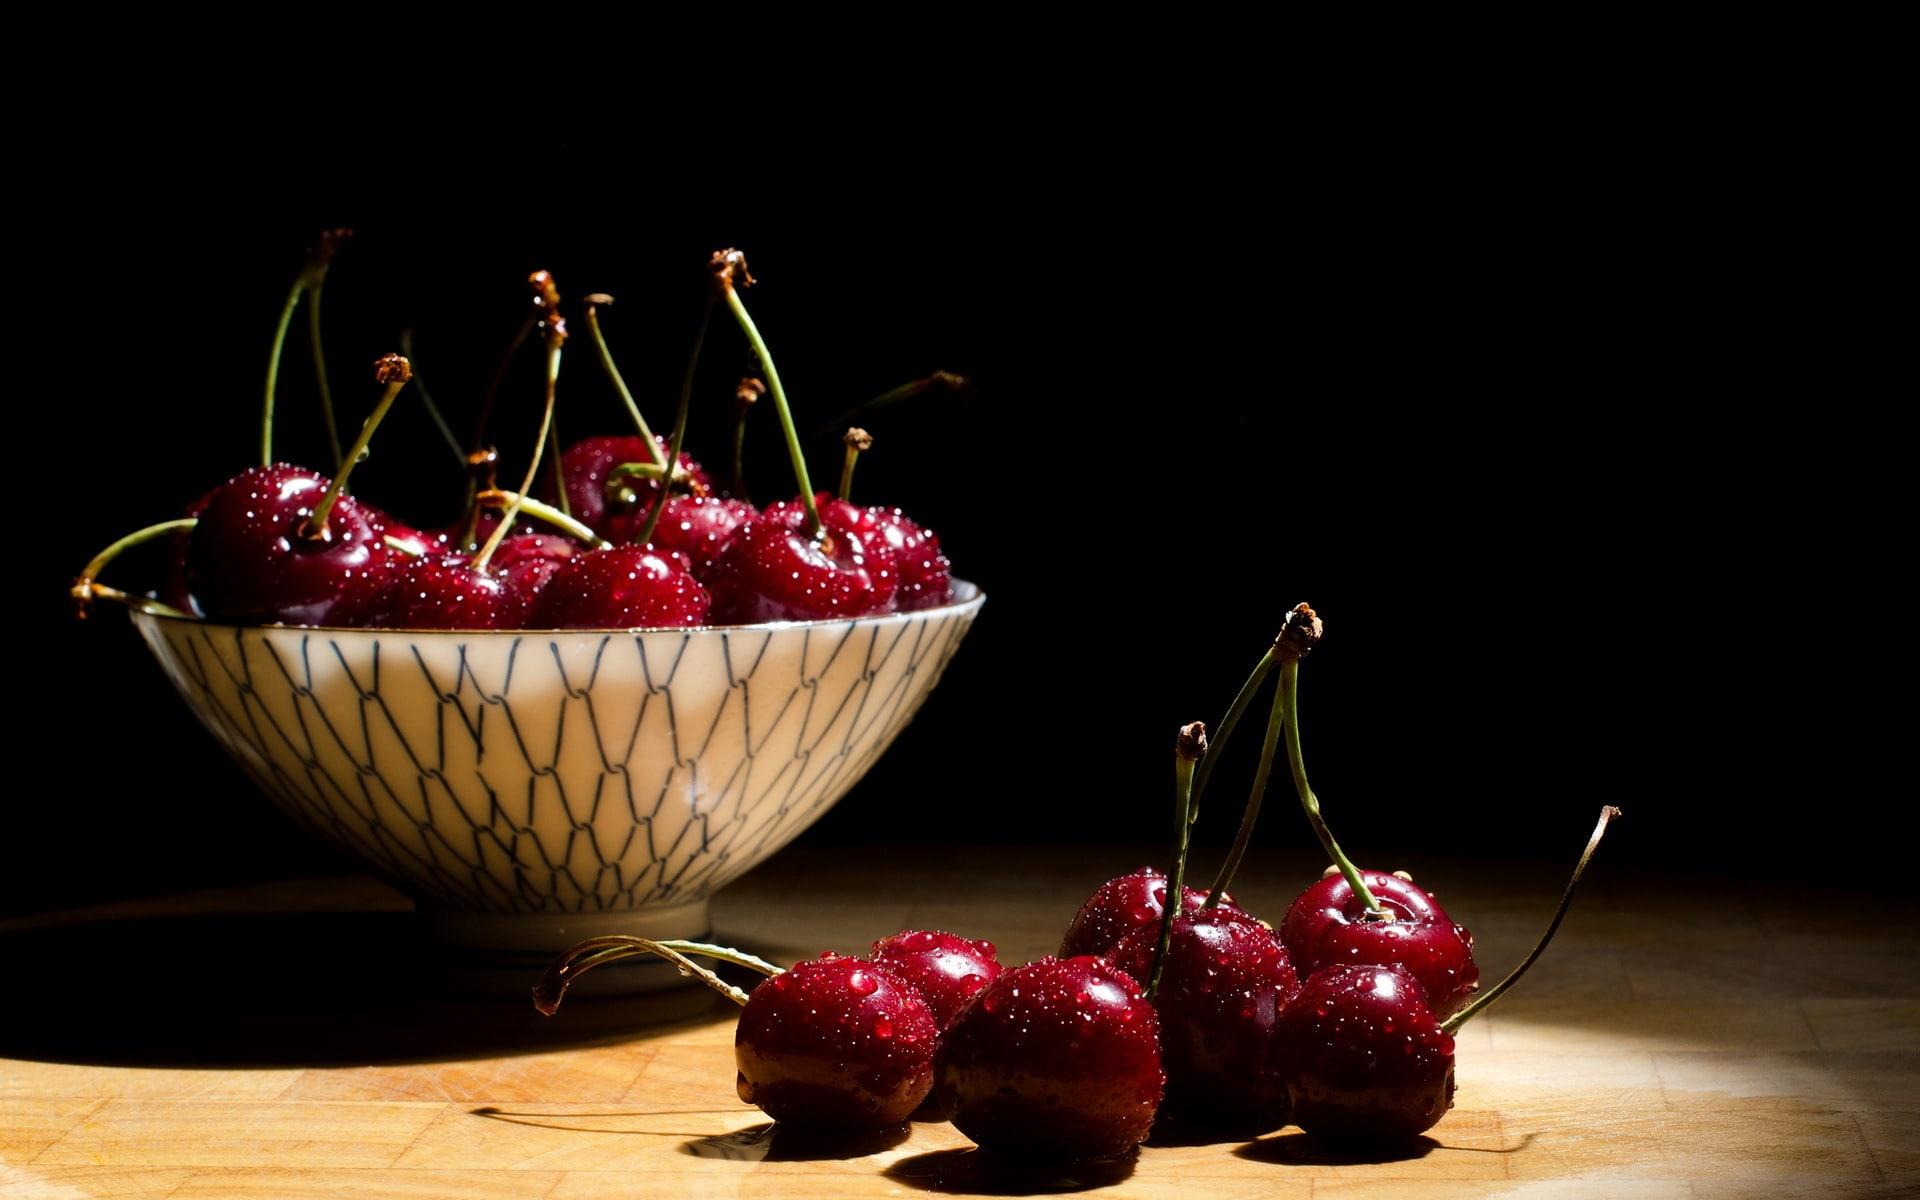 Cherry HD